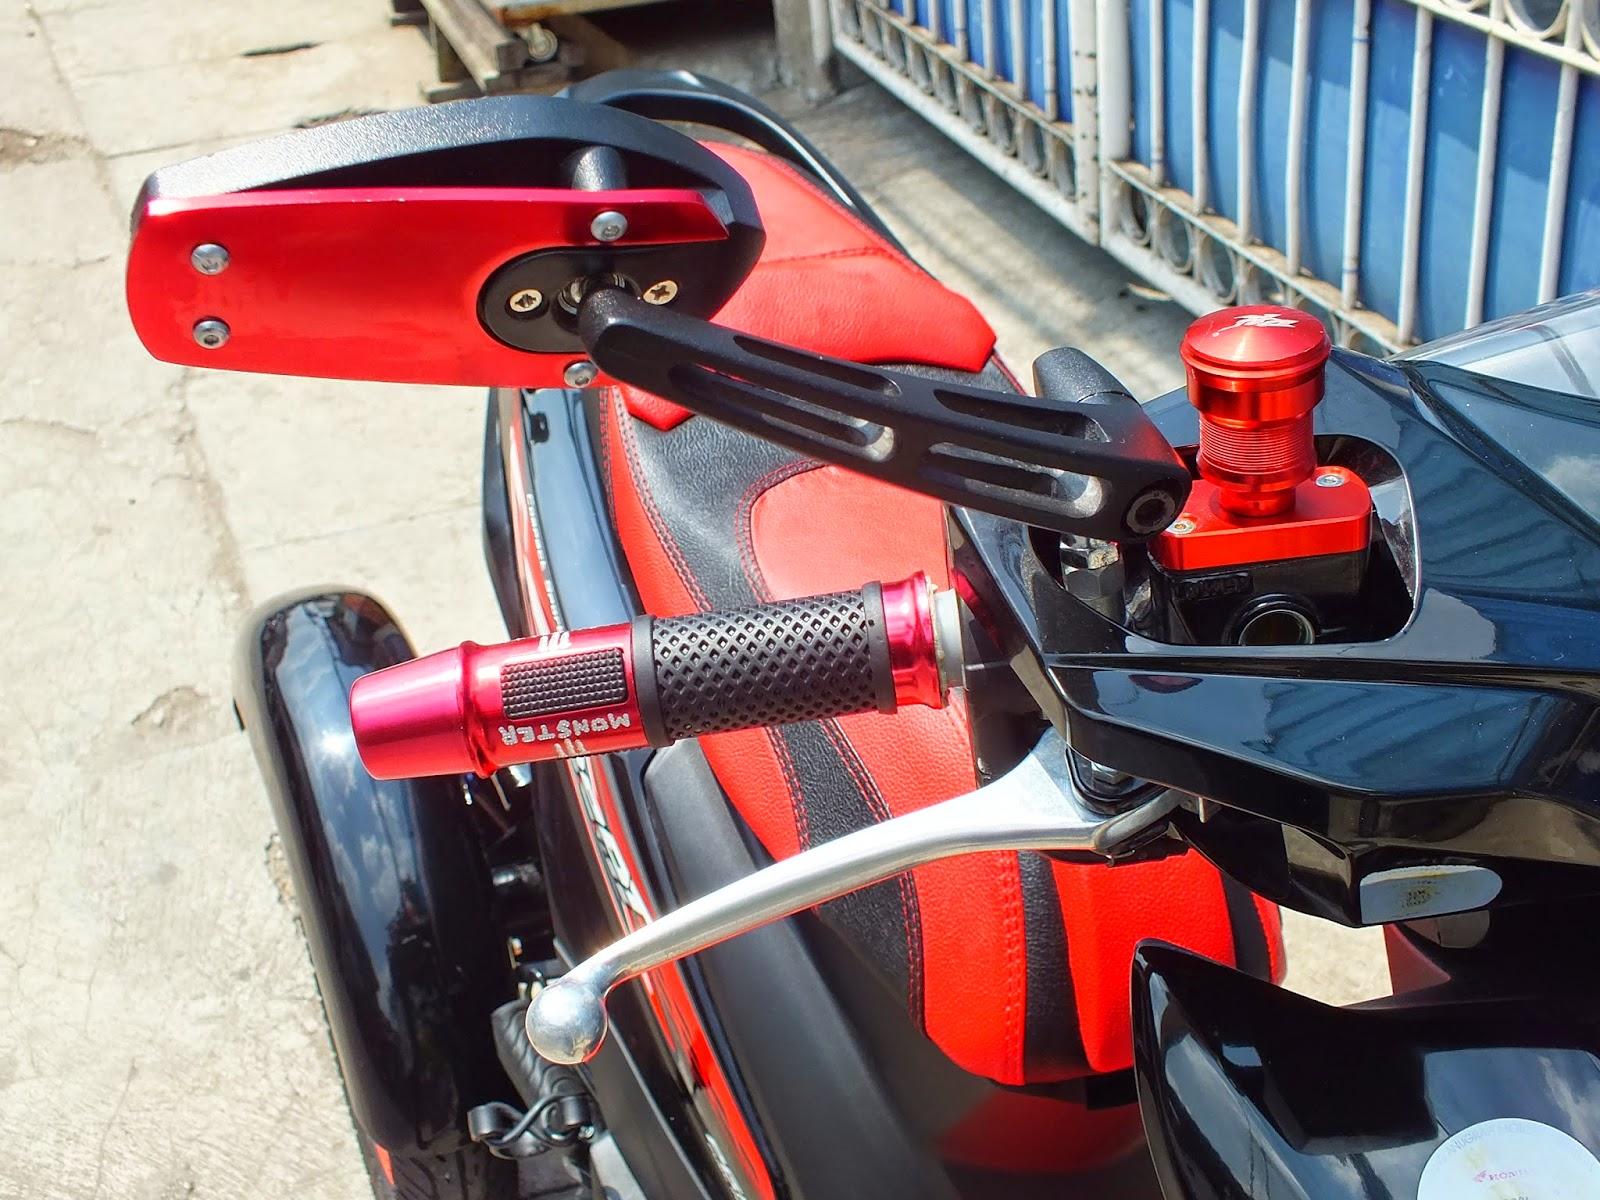 Kumpulan Modifikasi Motor Matic Beat Warna Merah Terbaru Pojok Cover Tutup Knalpot Honda Vario 125 Oracle Modification Concept Roda 3 Konsep Middle Class